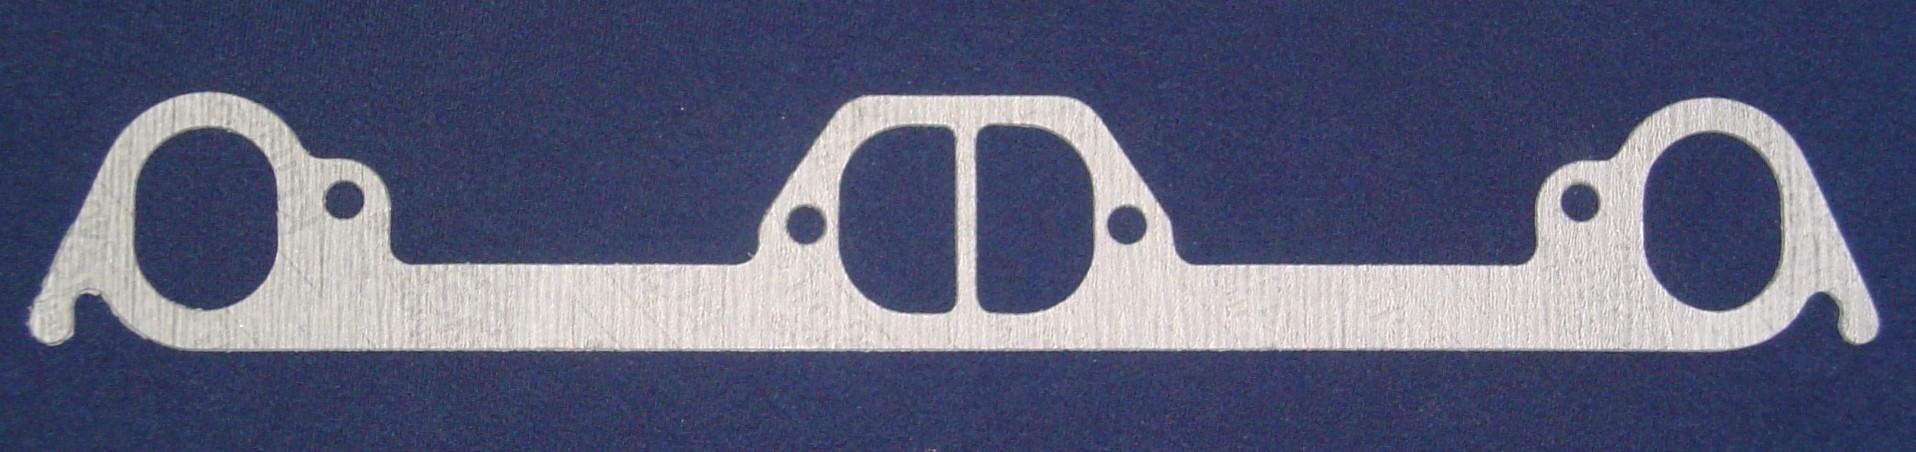 Tin Indian Performance - Pontiac Exhaust Gaskets